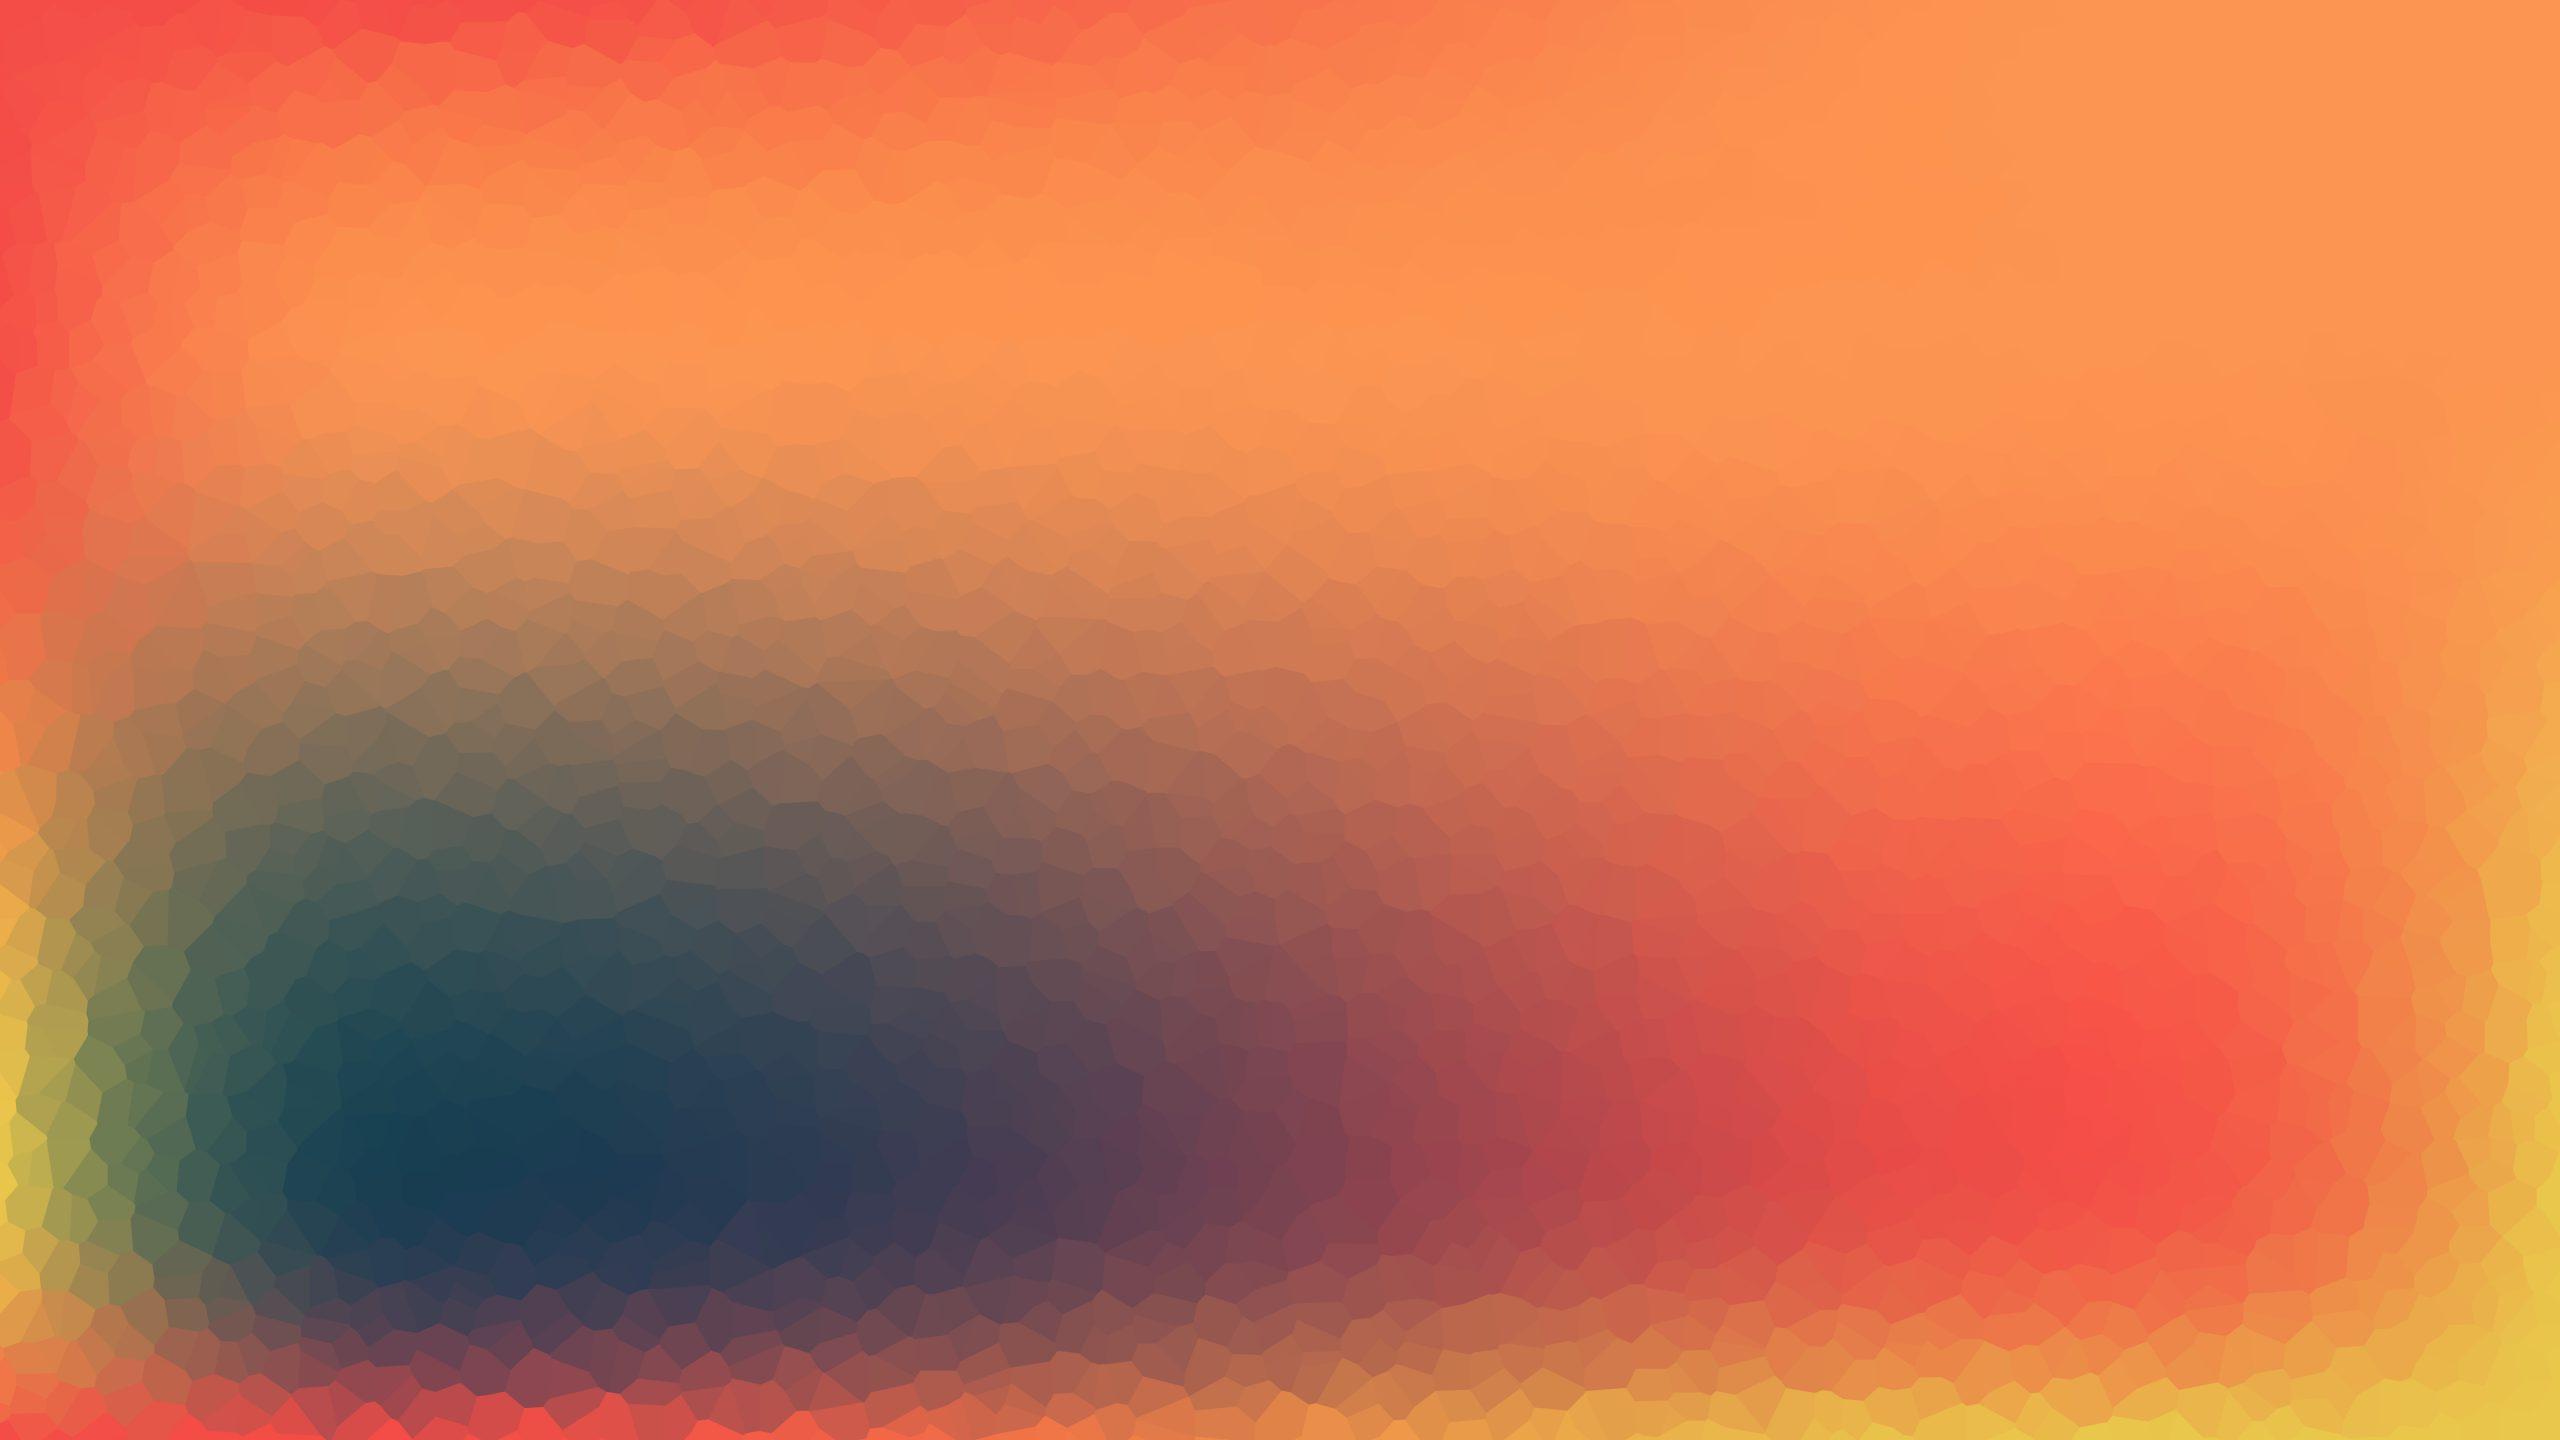 An orange color desktop wallpaper